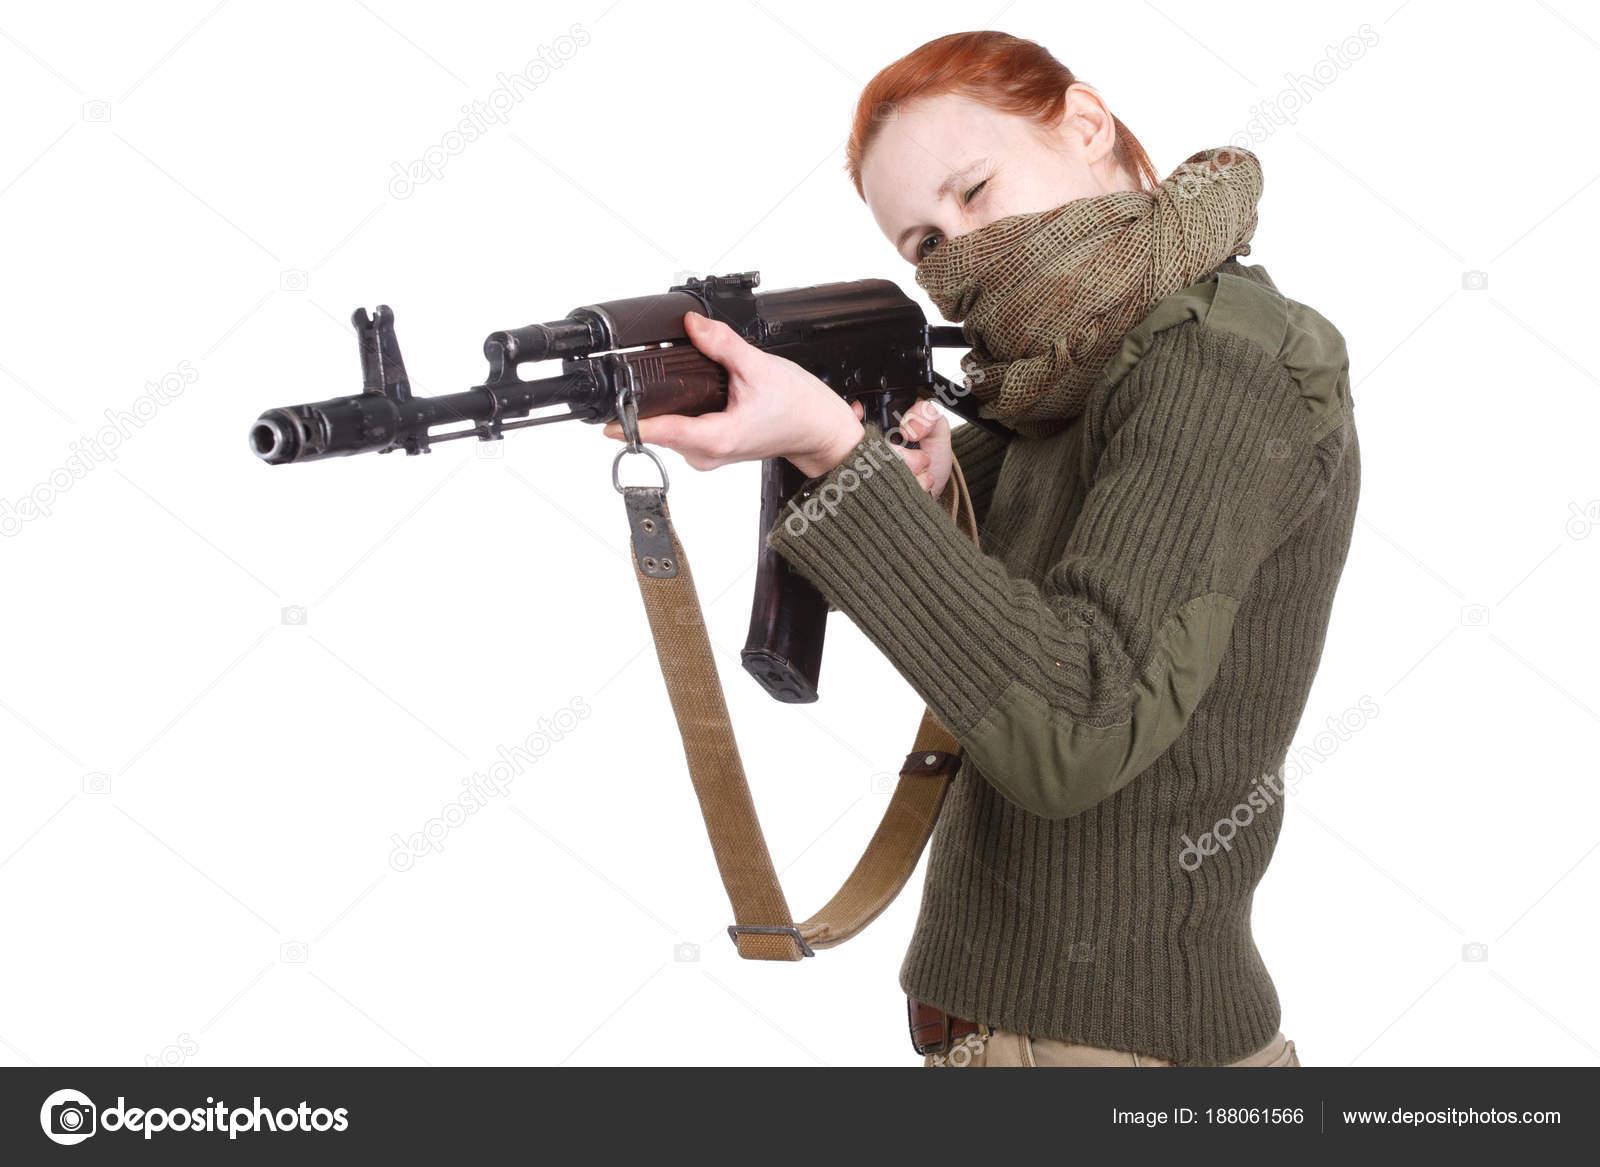 Pusher Girl shooting a tactical ak 47 assault rifle in